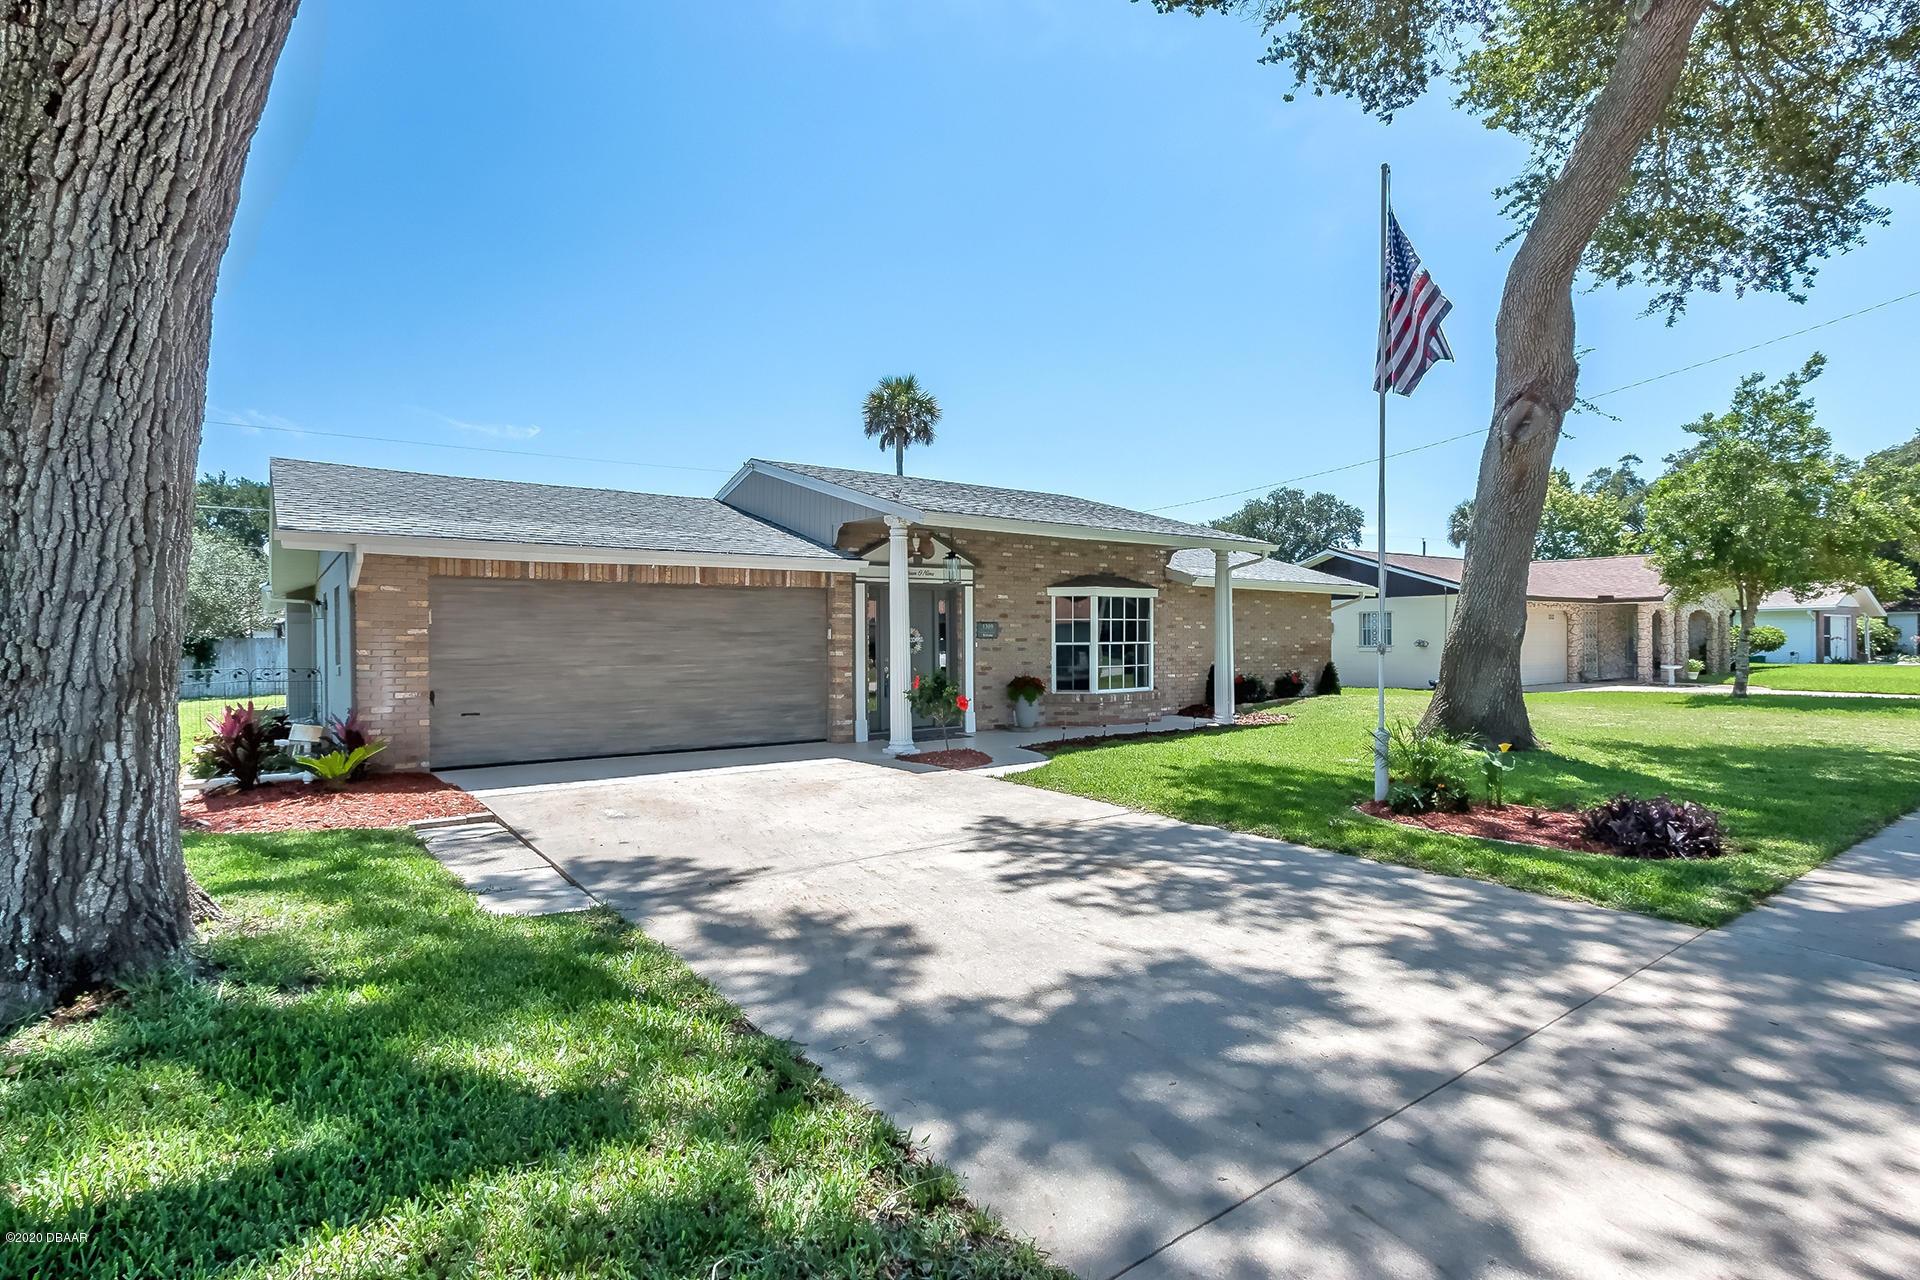 Photo of 1309 Ruthbern Road, Daytona Beach, FL 32114